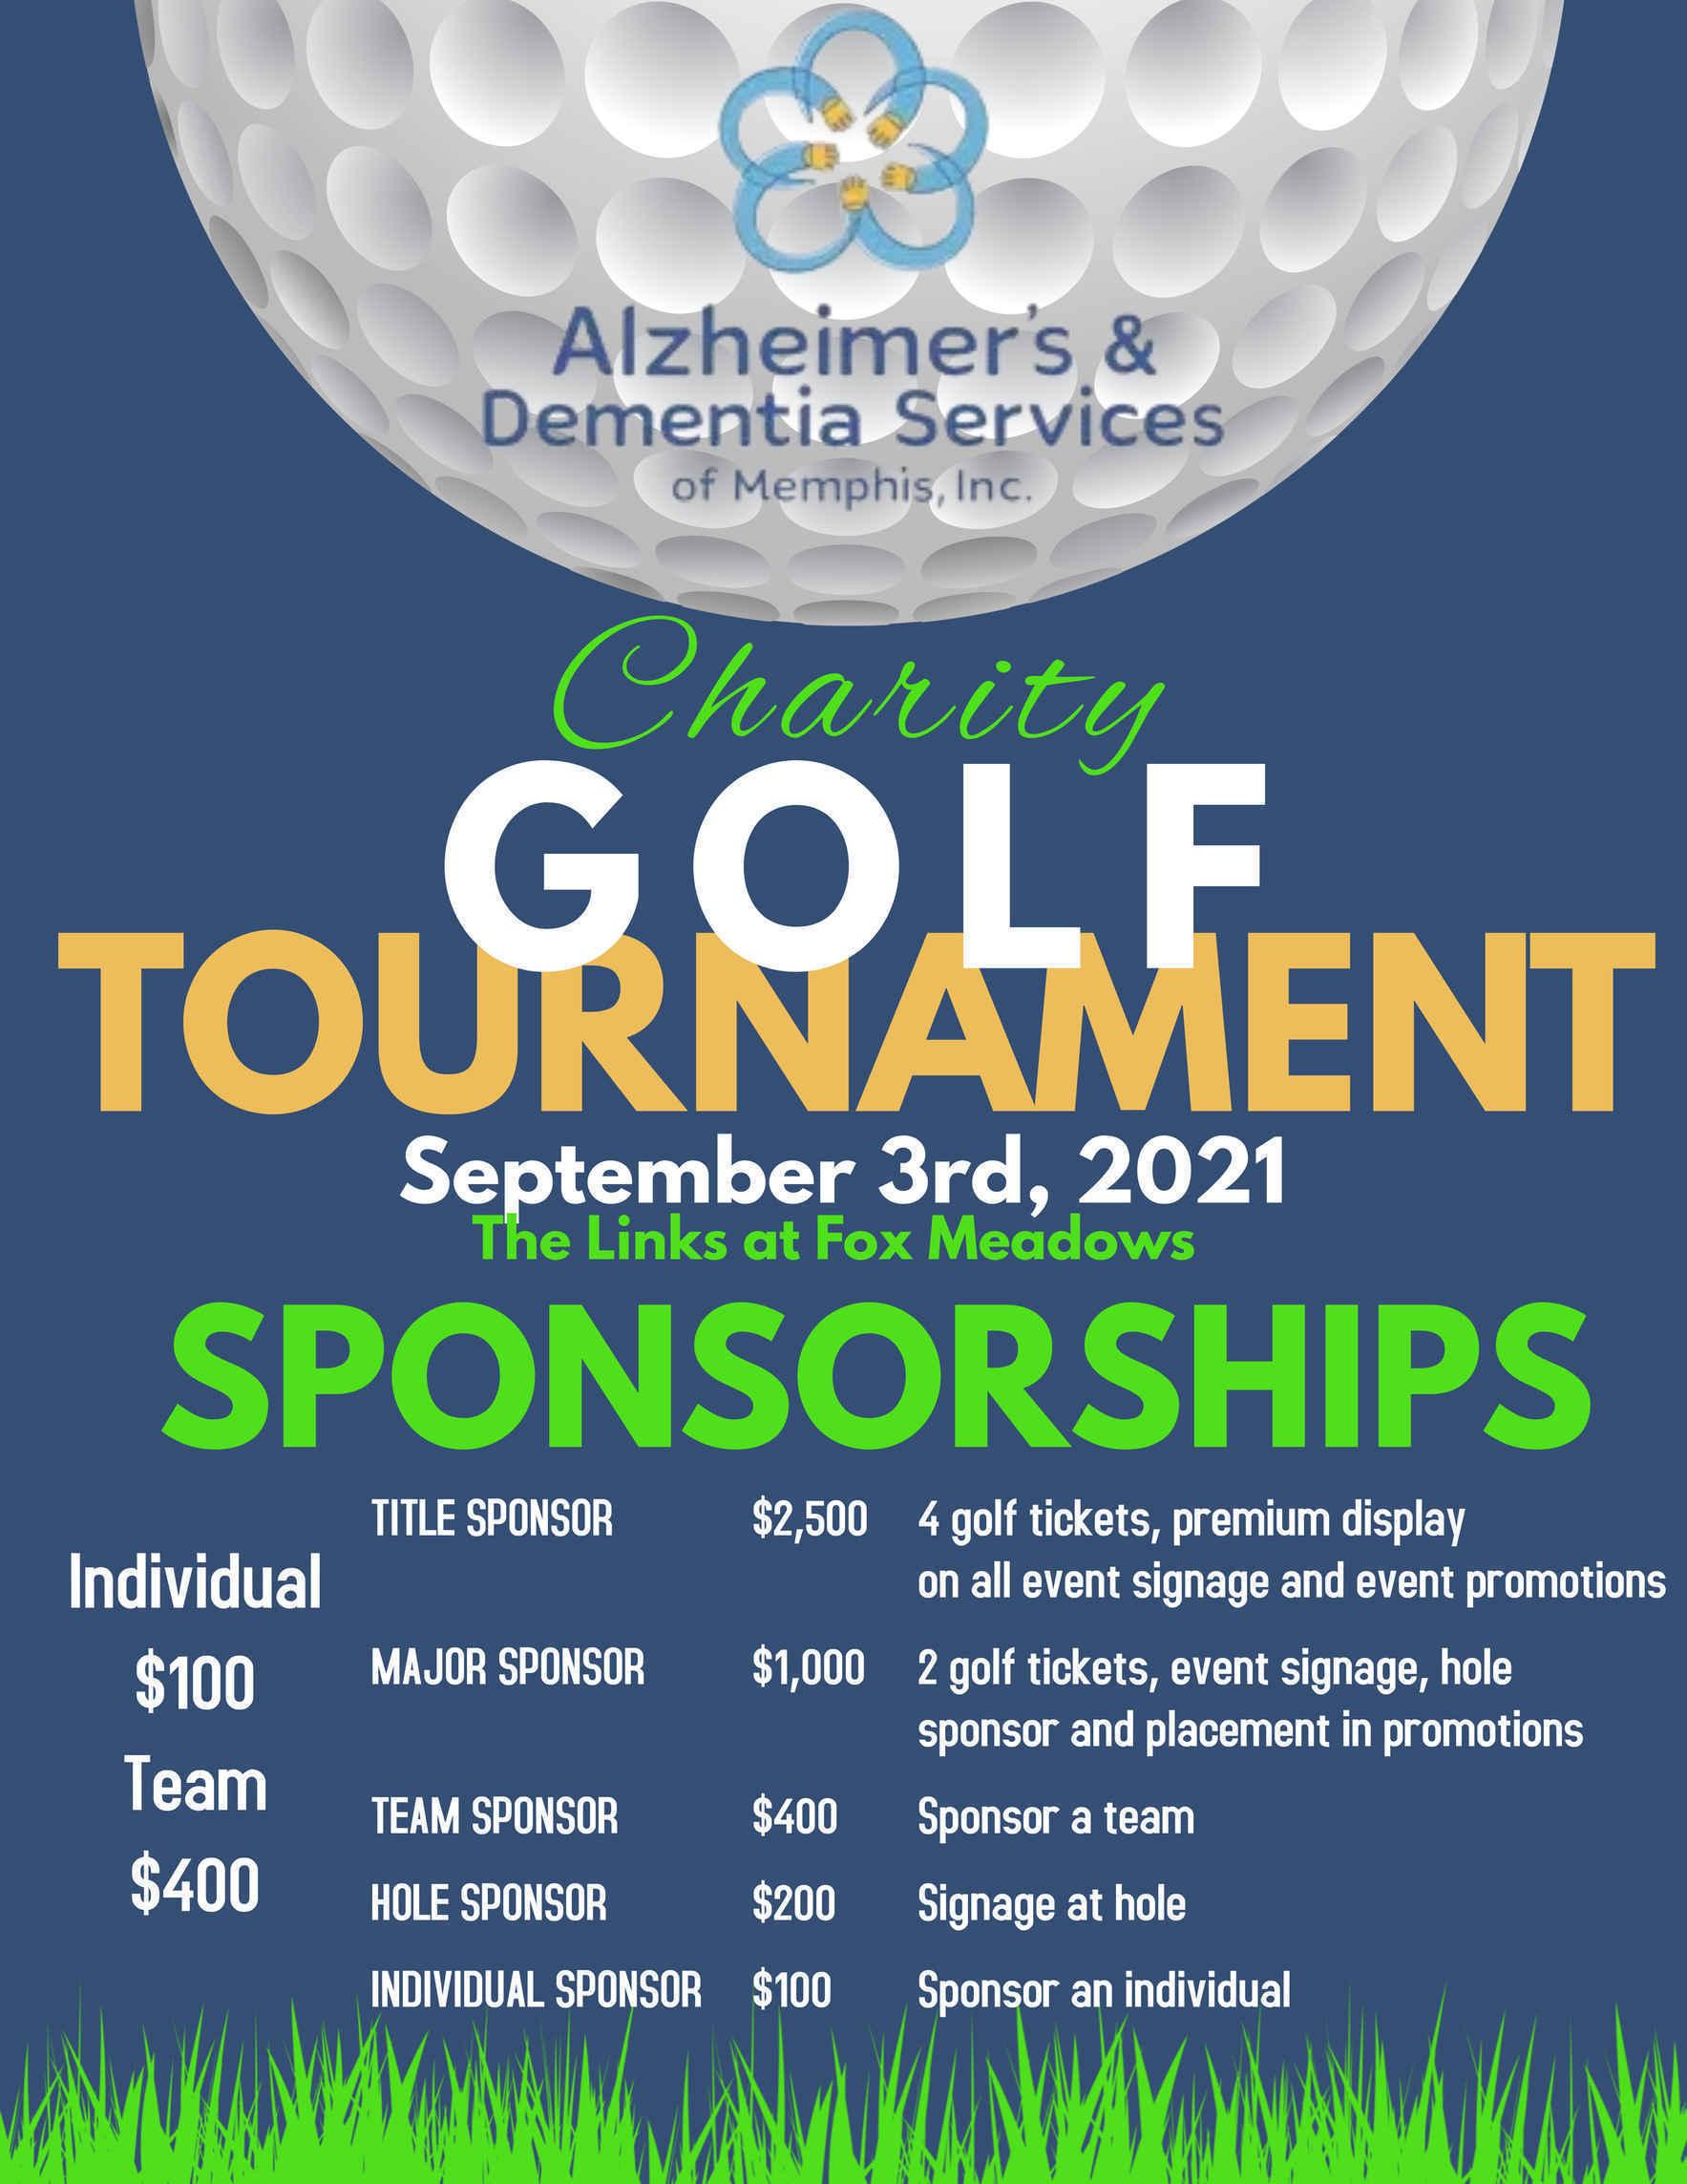 Alzheimer's & Dementia Services of Memphis, Inc. Charity Golf Tournament image